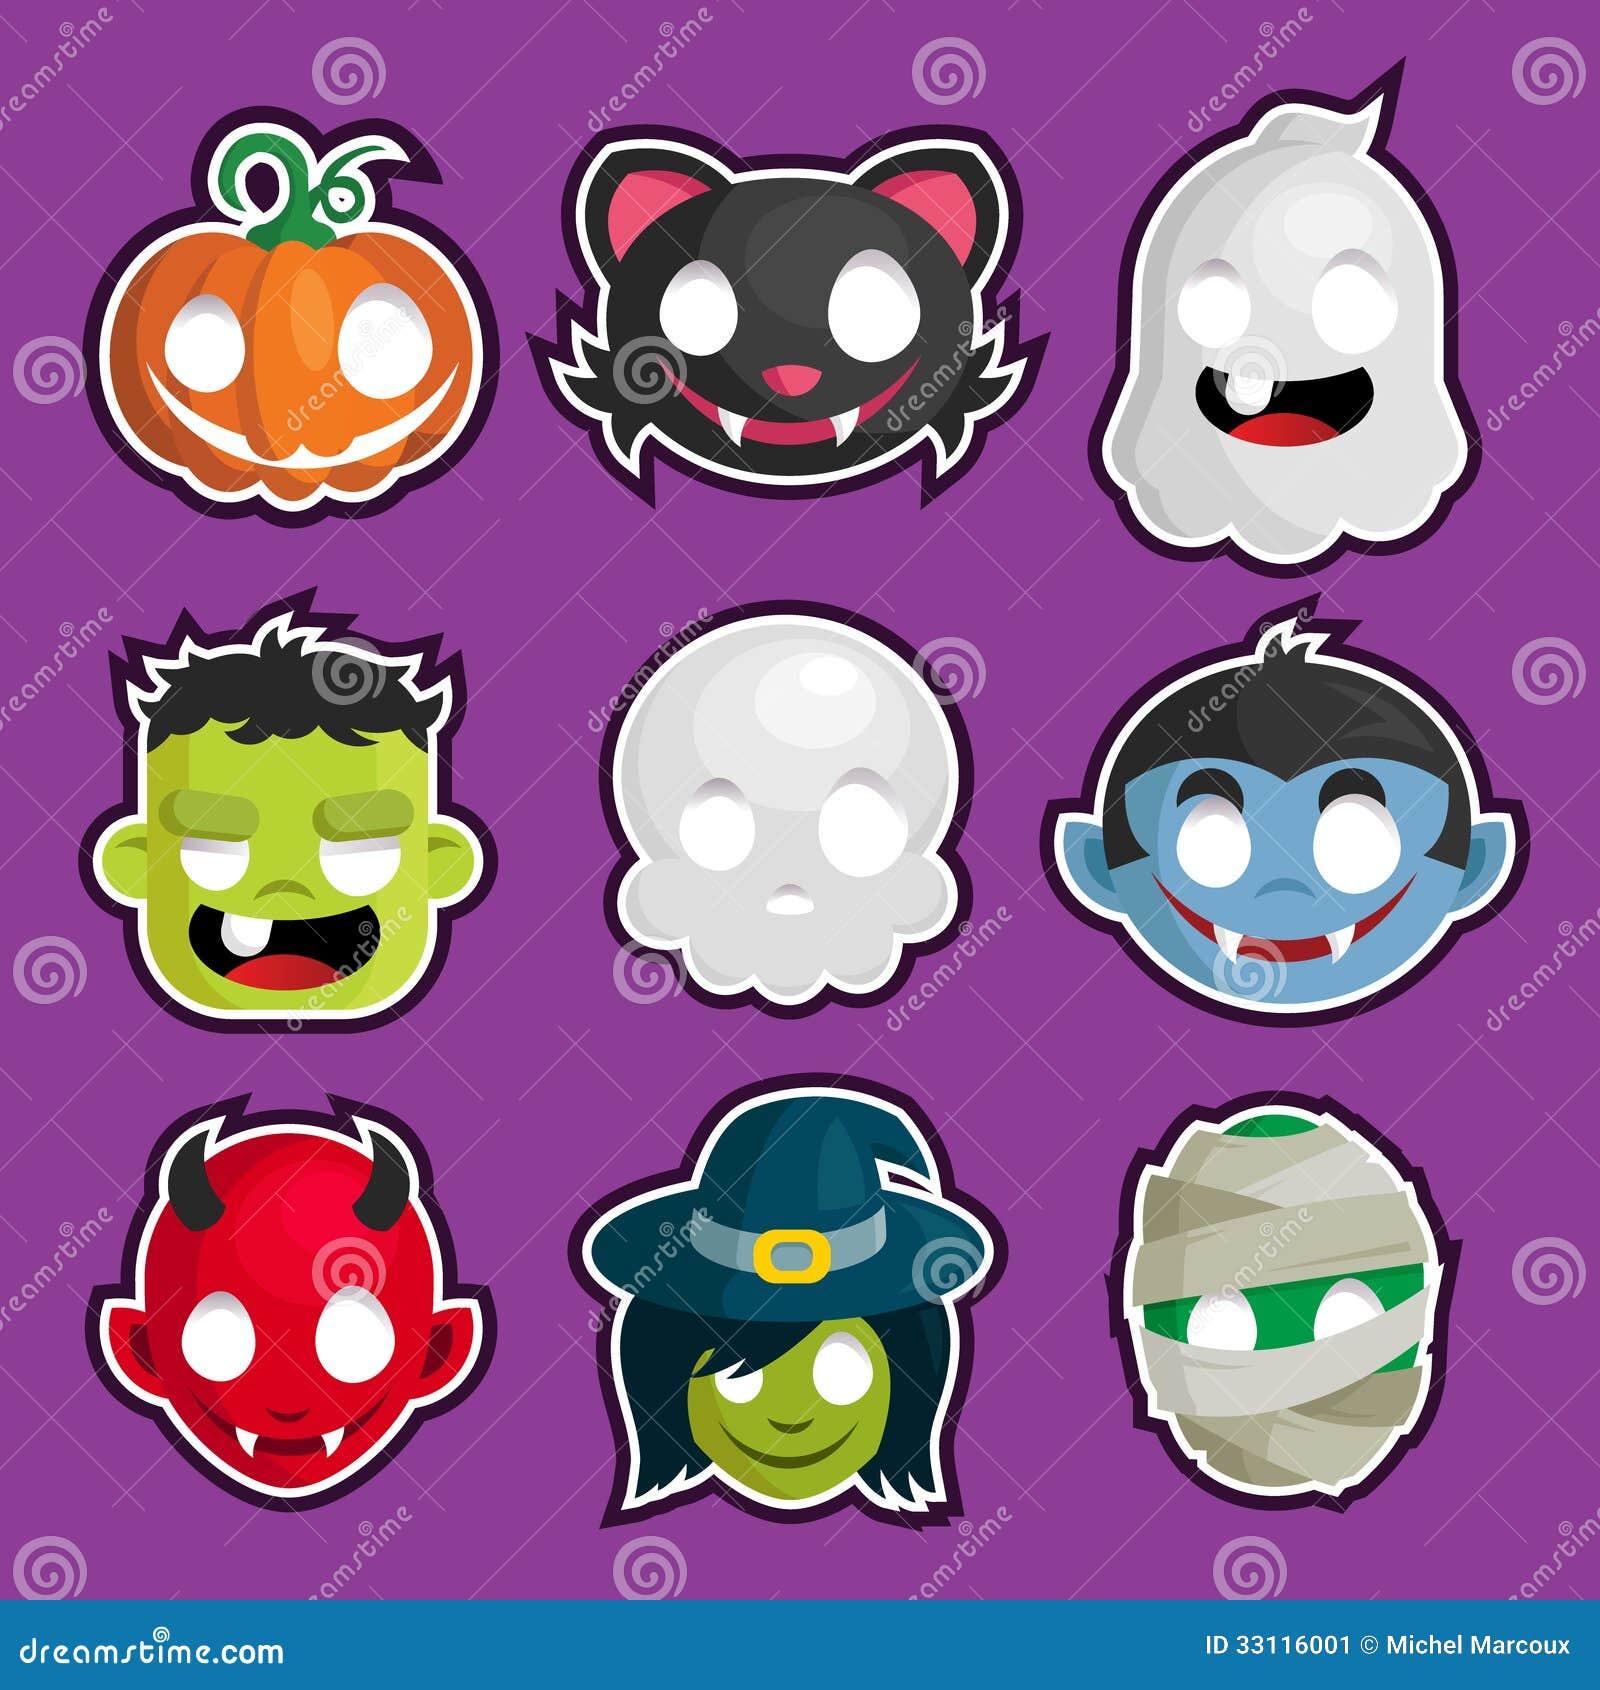 Halloween Head Stickers Stock Image - Image: 33116001